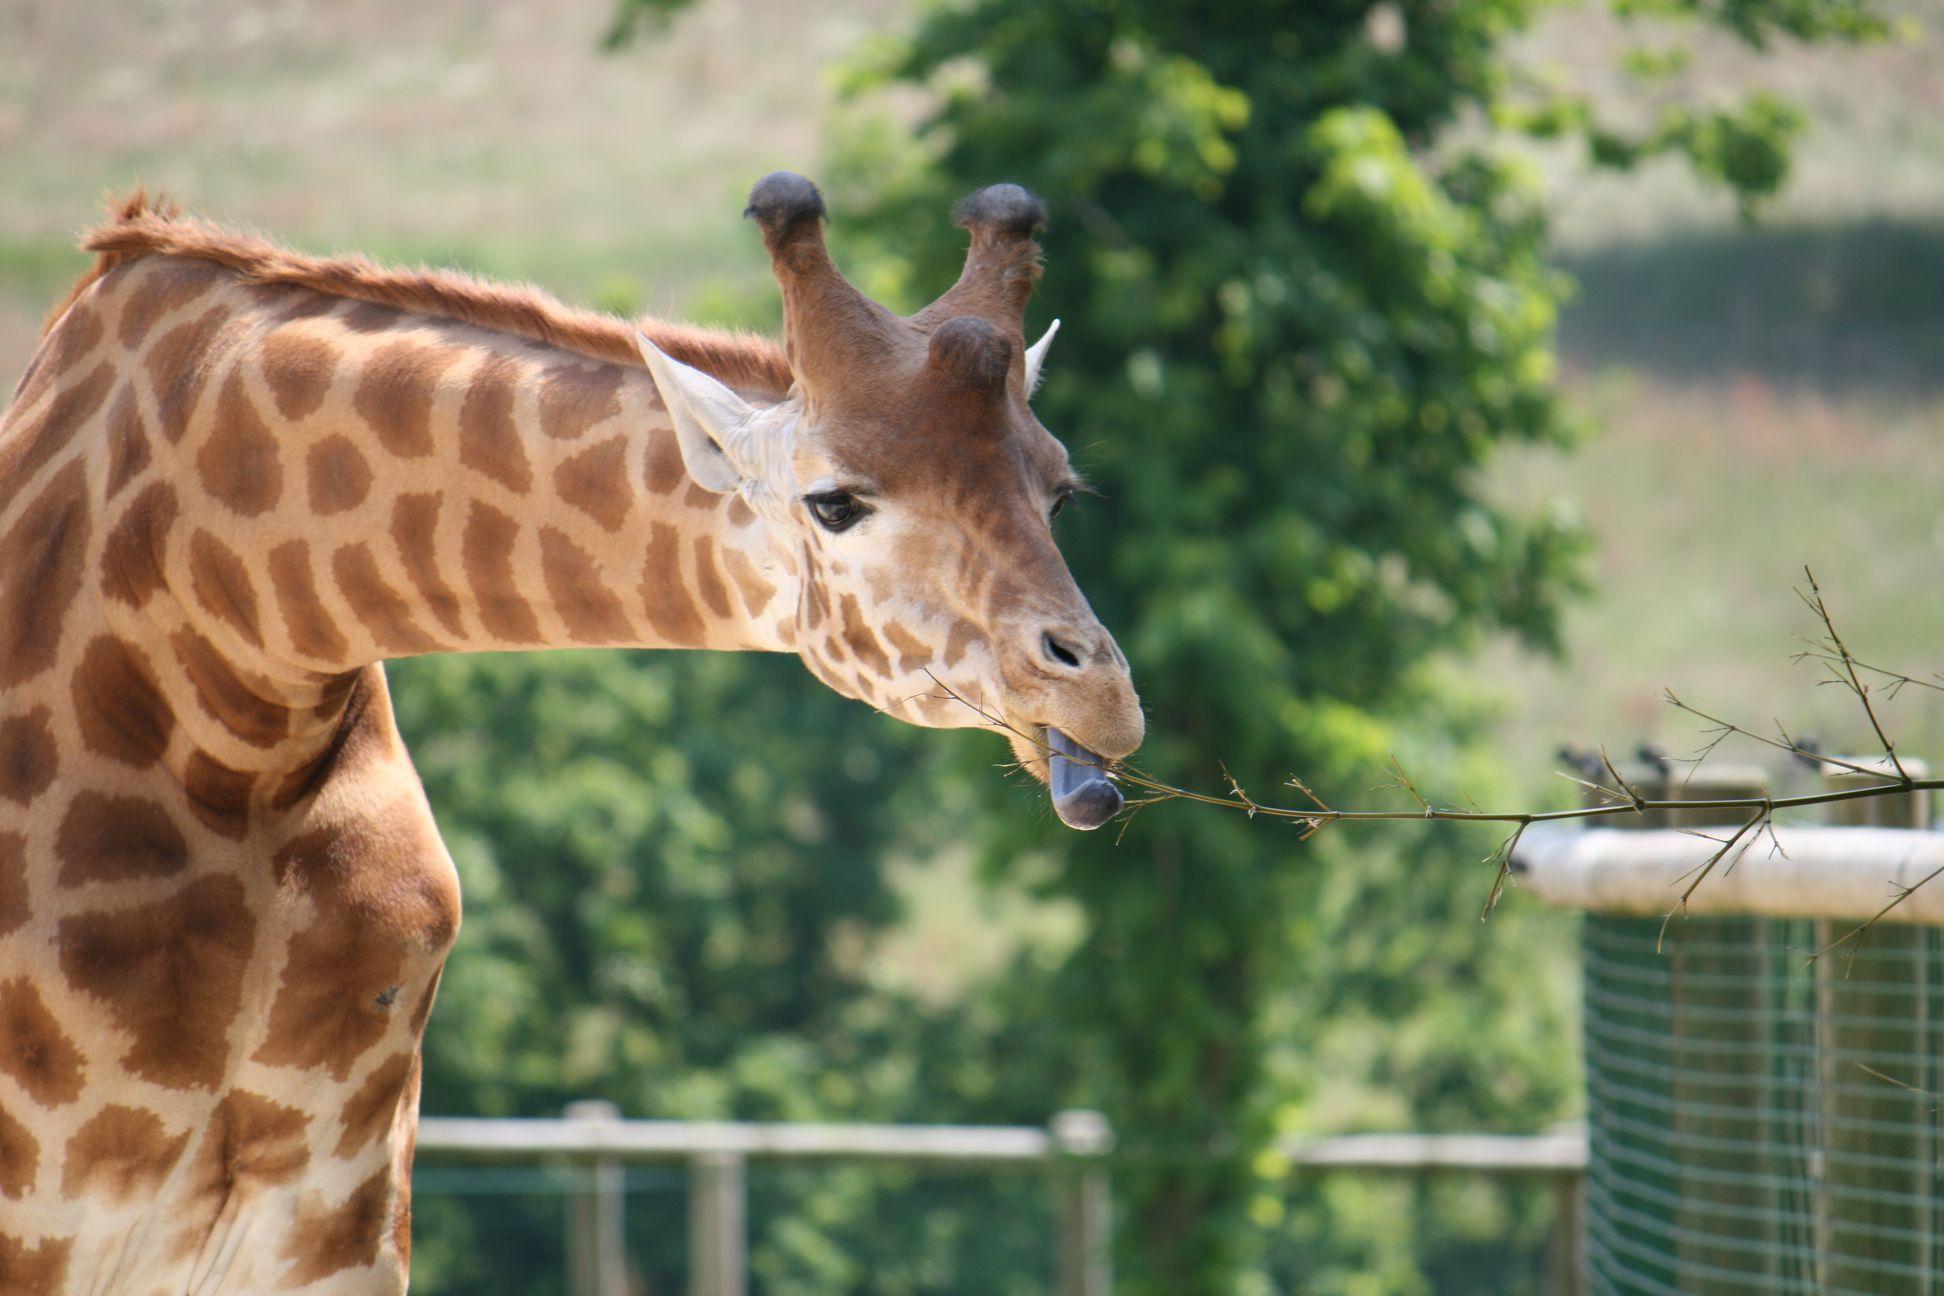 La langue bleue de la girafe